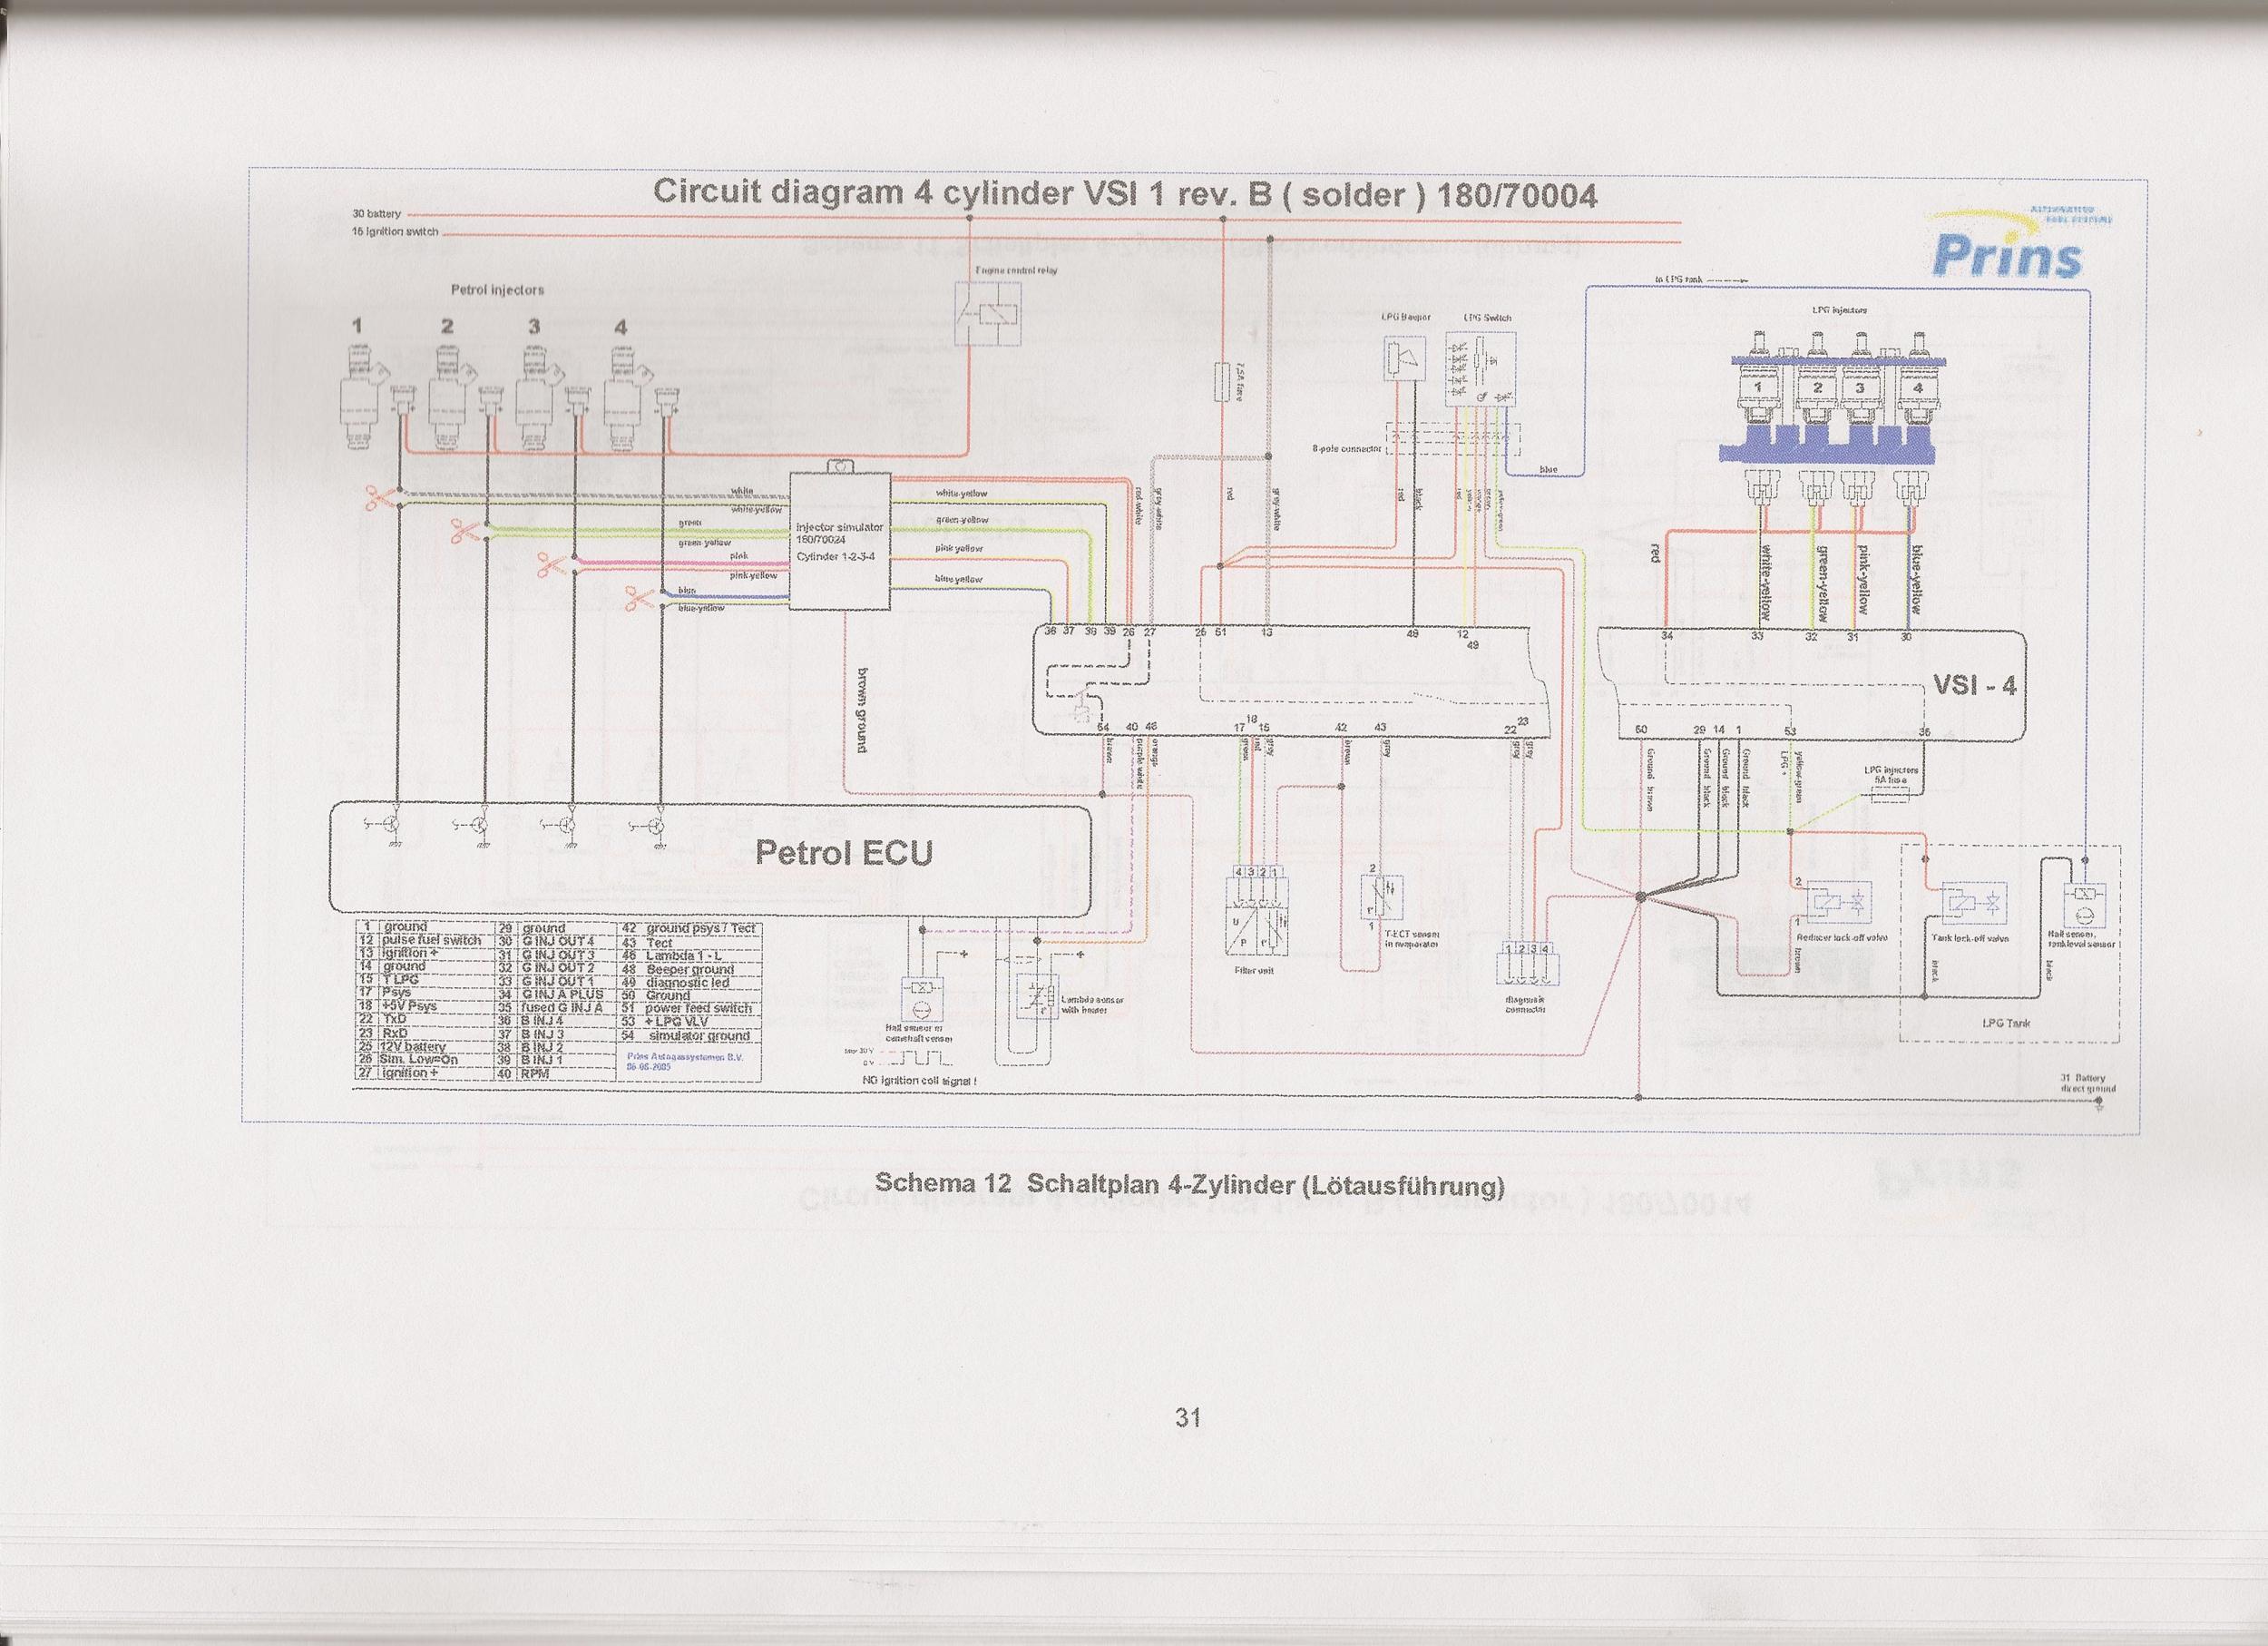 Tolle Lpg Schaltplan Galerie - Schaltplan Serie Circuit Collection ...